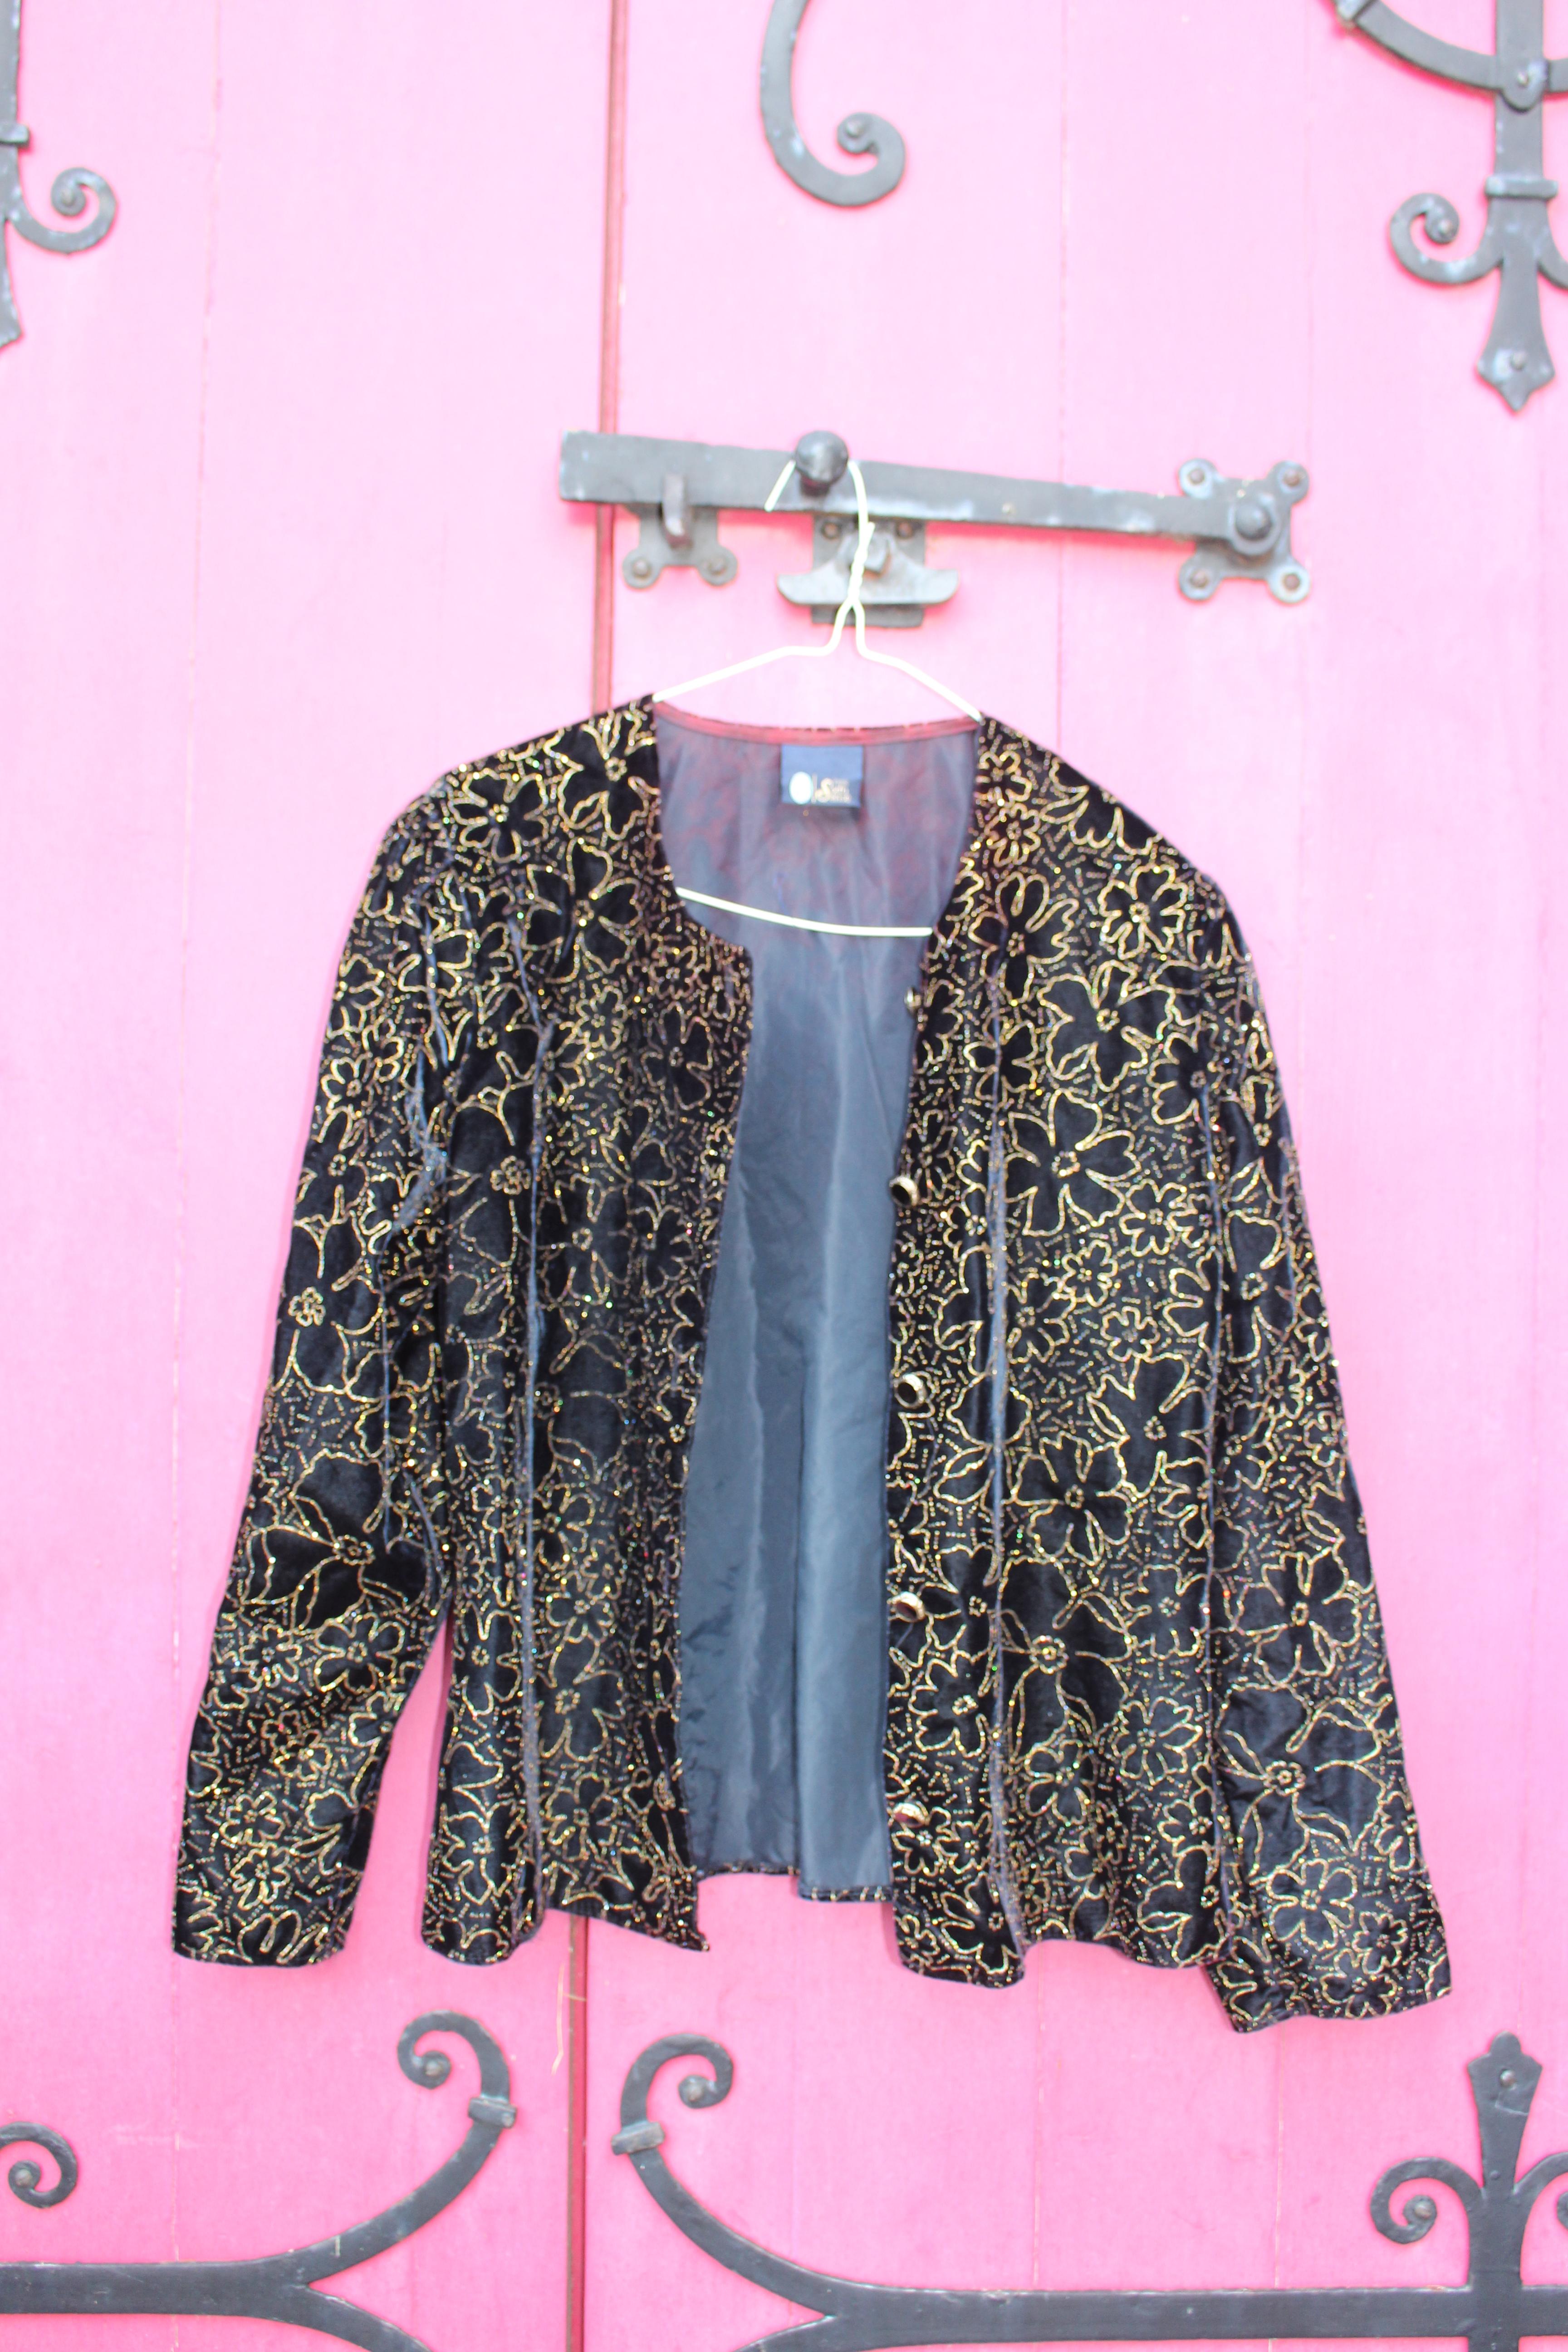 Your Sixth Sense glittery cropped velvet jacket, from Unicorn, 5 Ship Street, Oxford